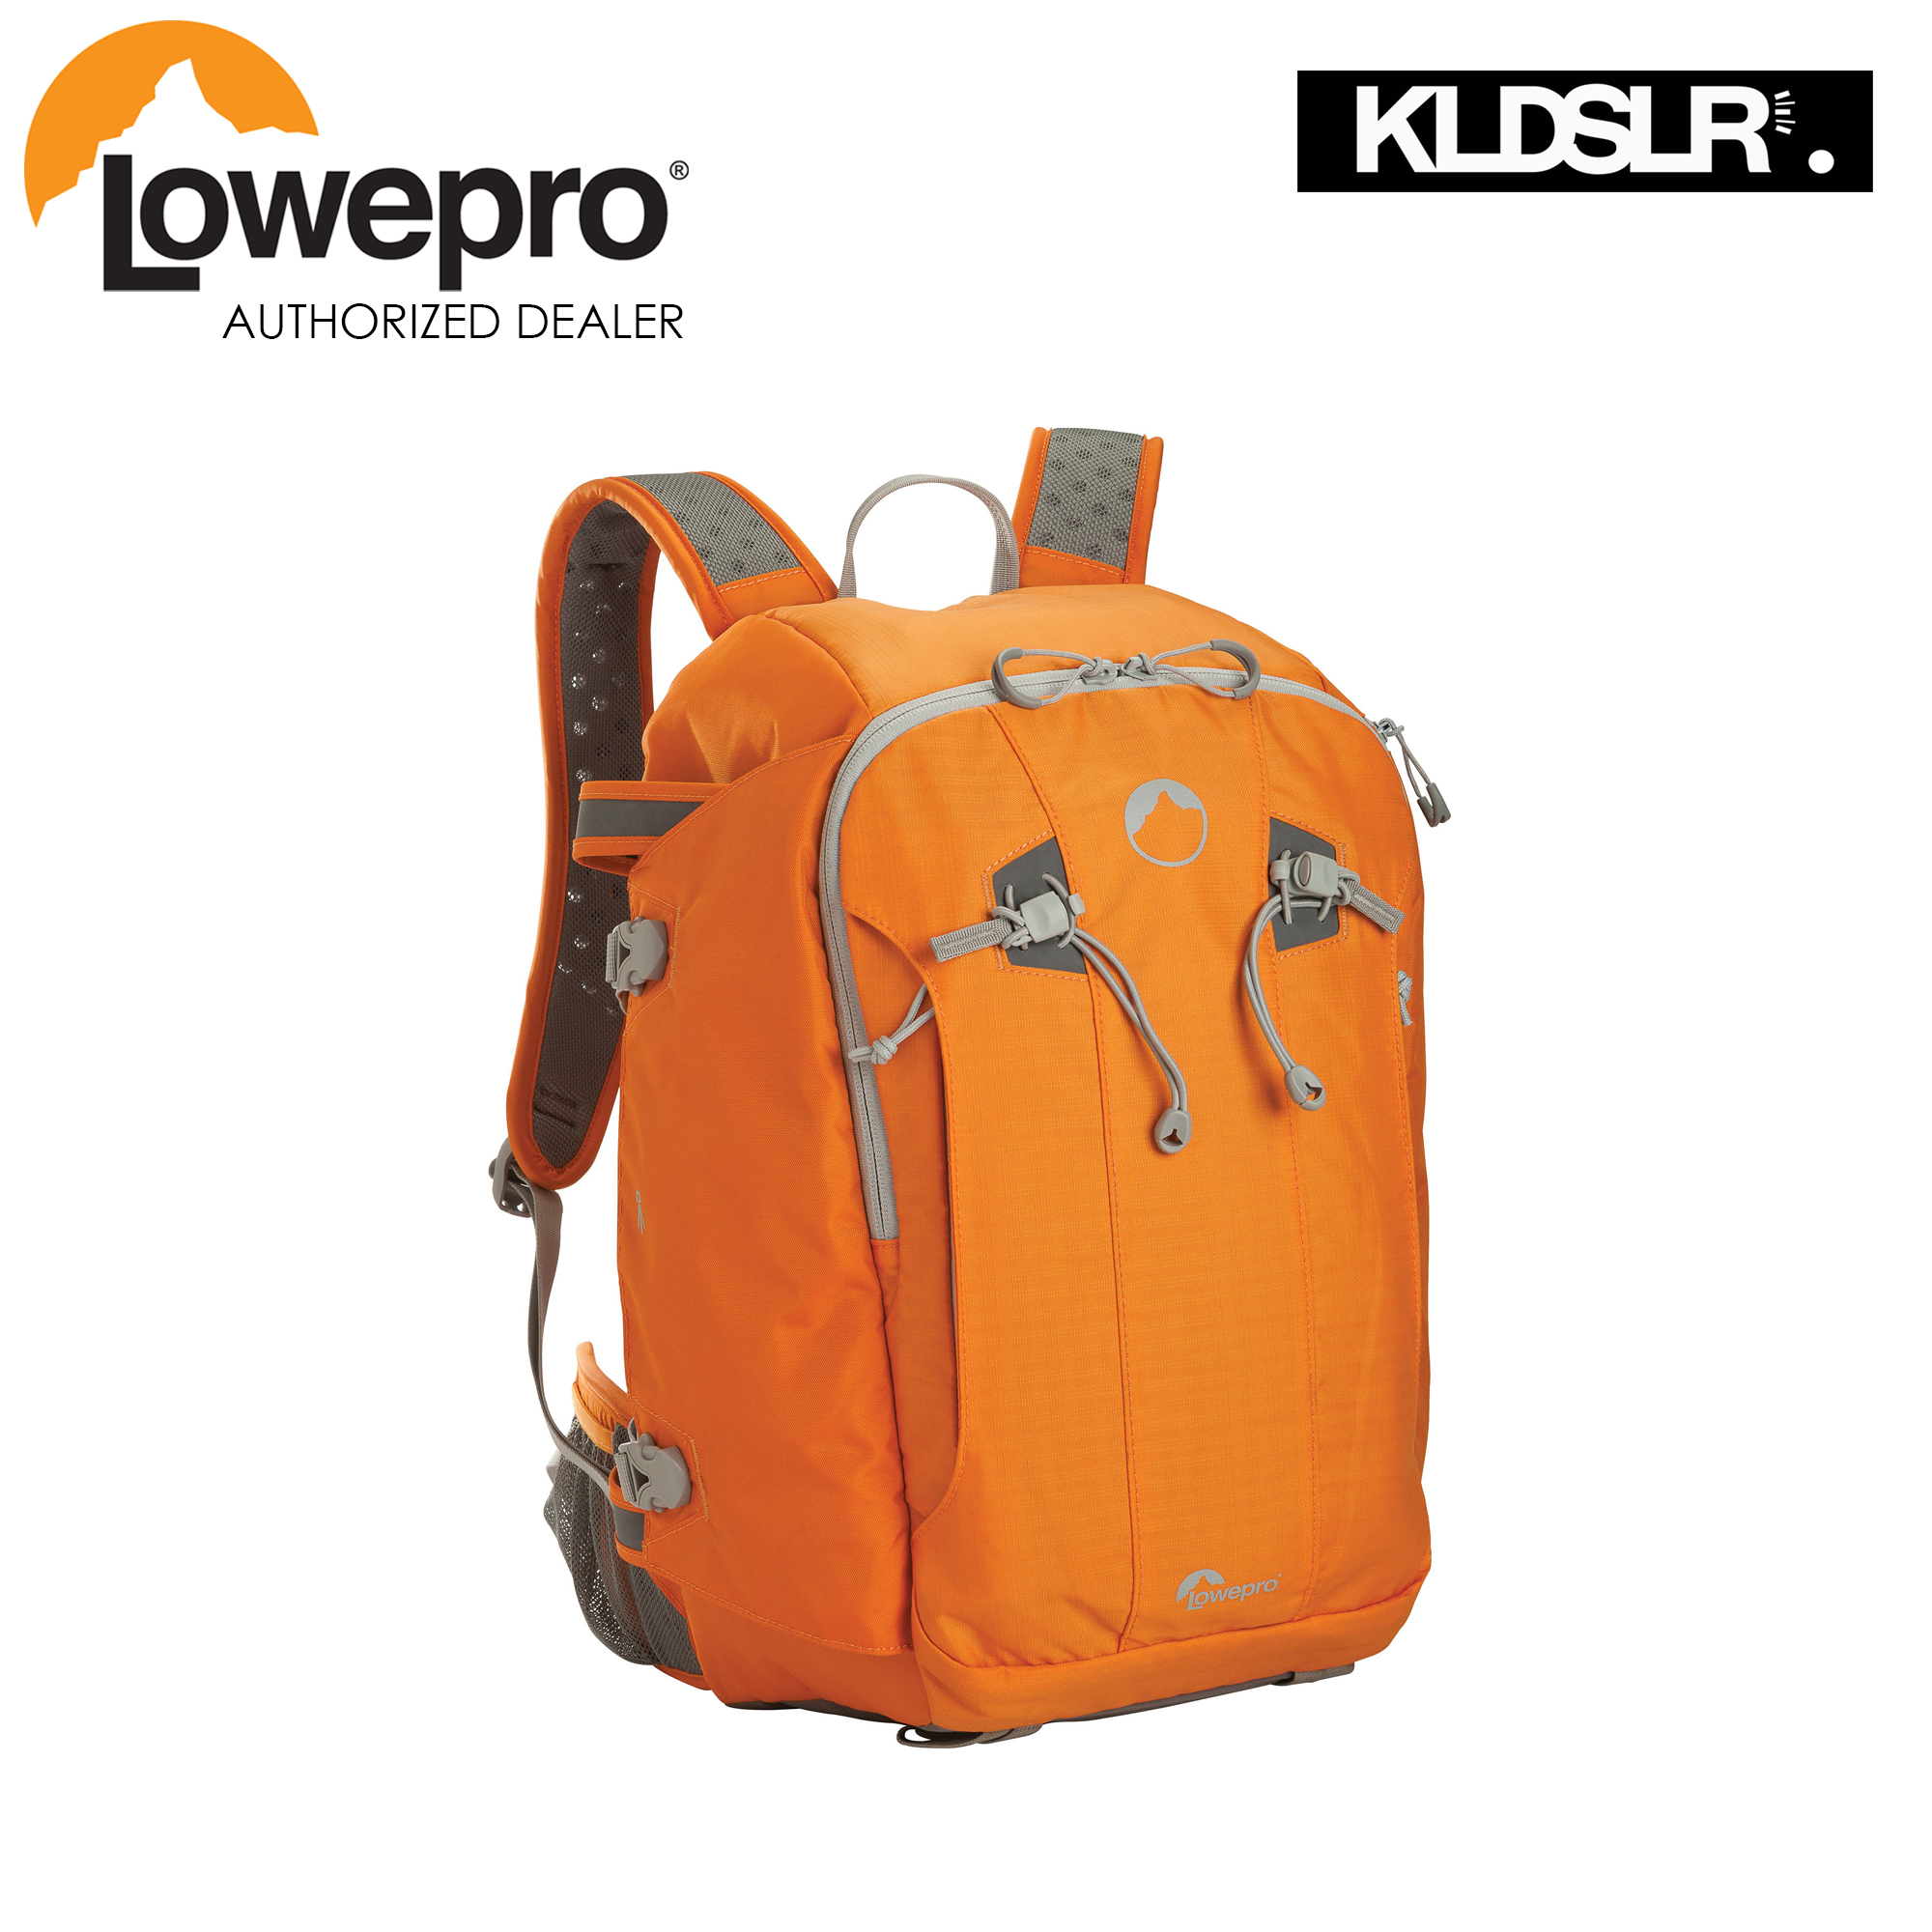 Lowepro Flipside Sport 20l Aw Daypack Orange Light Gray Toploader Zoom 50 Ii Blue Accents